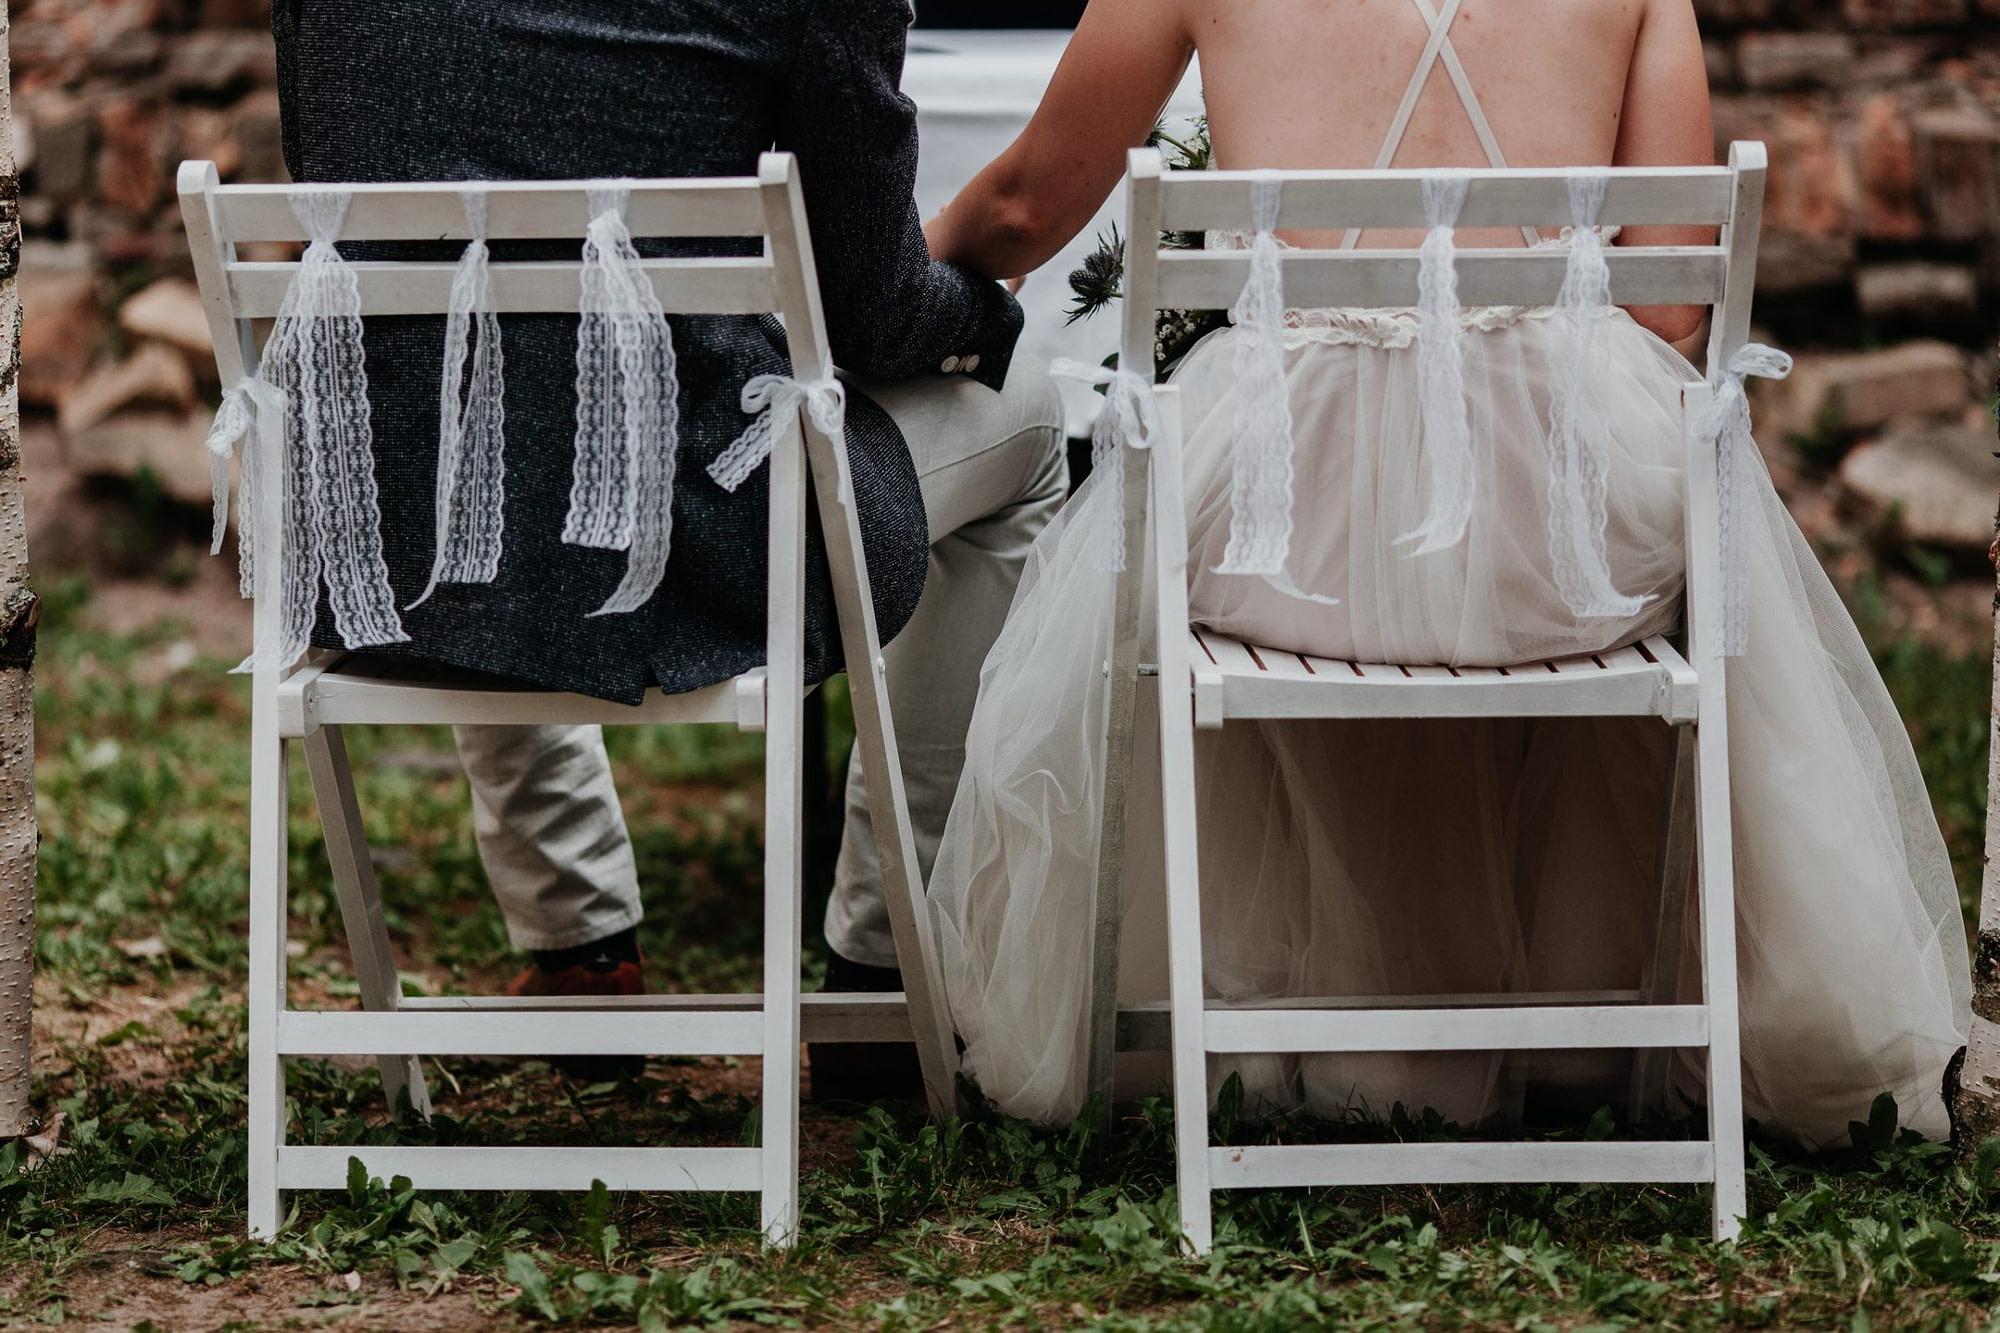 boho wedding, hochzeit berlin, braut, groom, bride, bräutigam, trauung, freie trauung, ceremony, chairs, chair decor